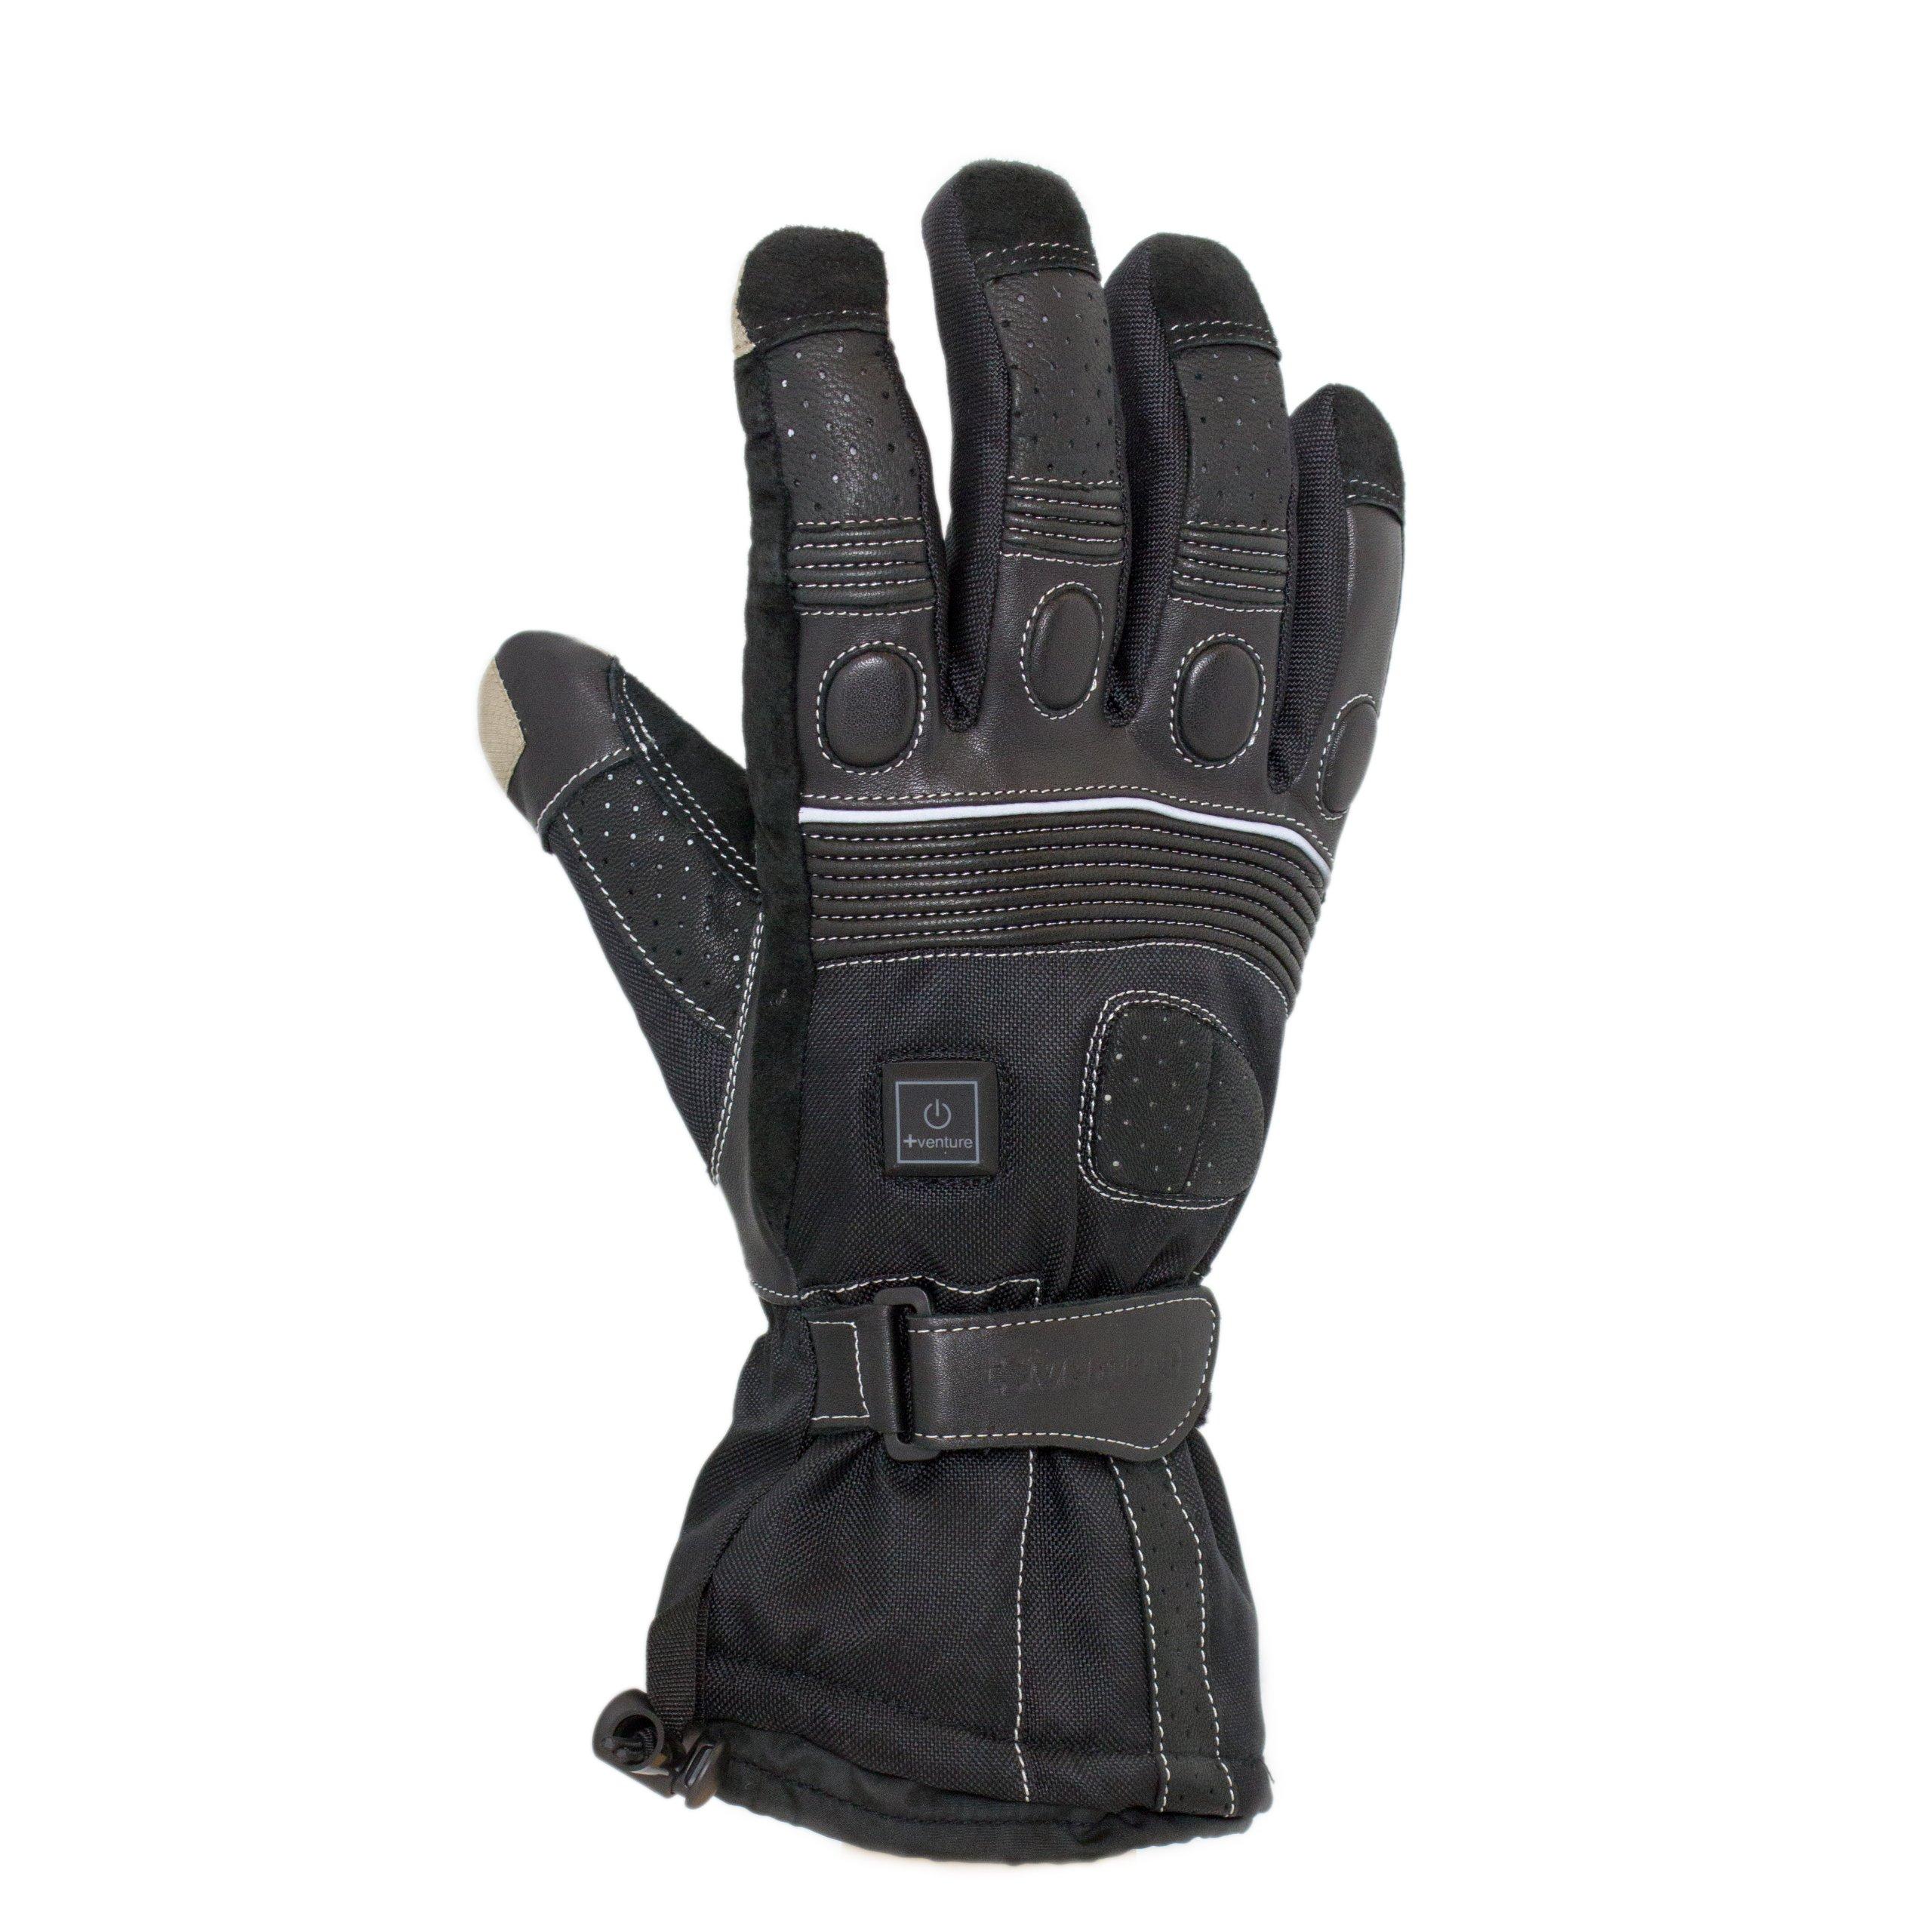 VentureHeat 12V Heated Grand Touring Motorcycle Gloves (Black, Medium)